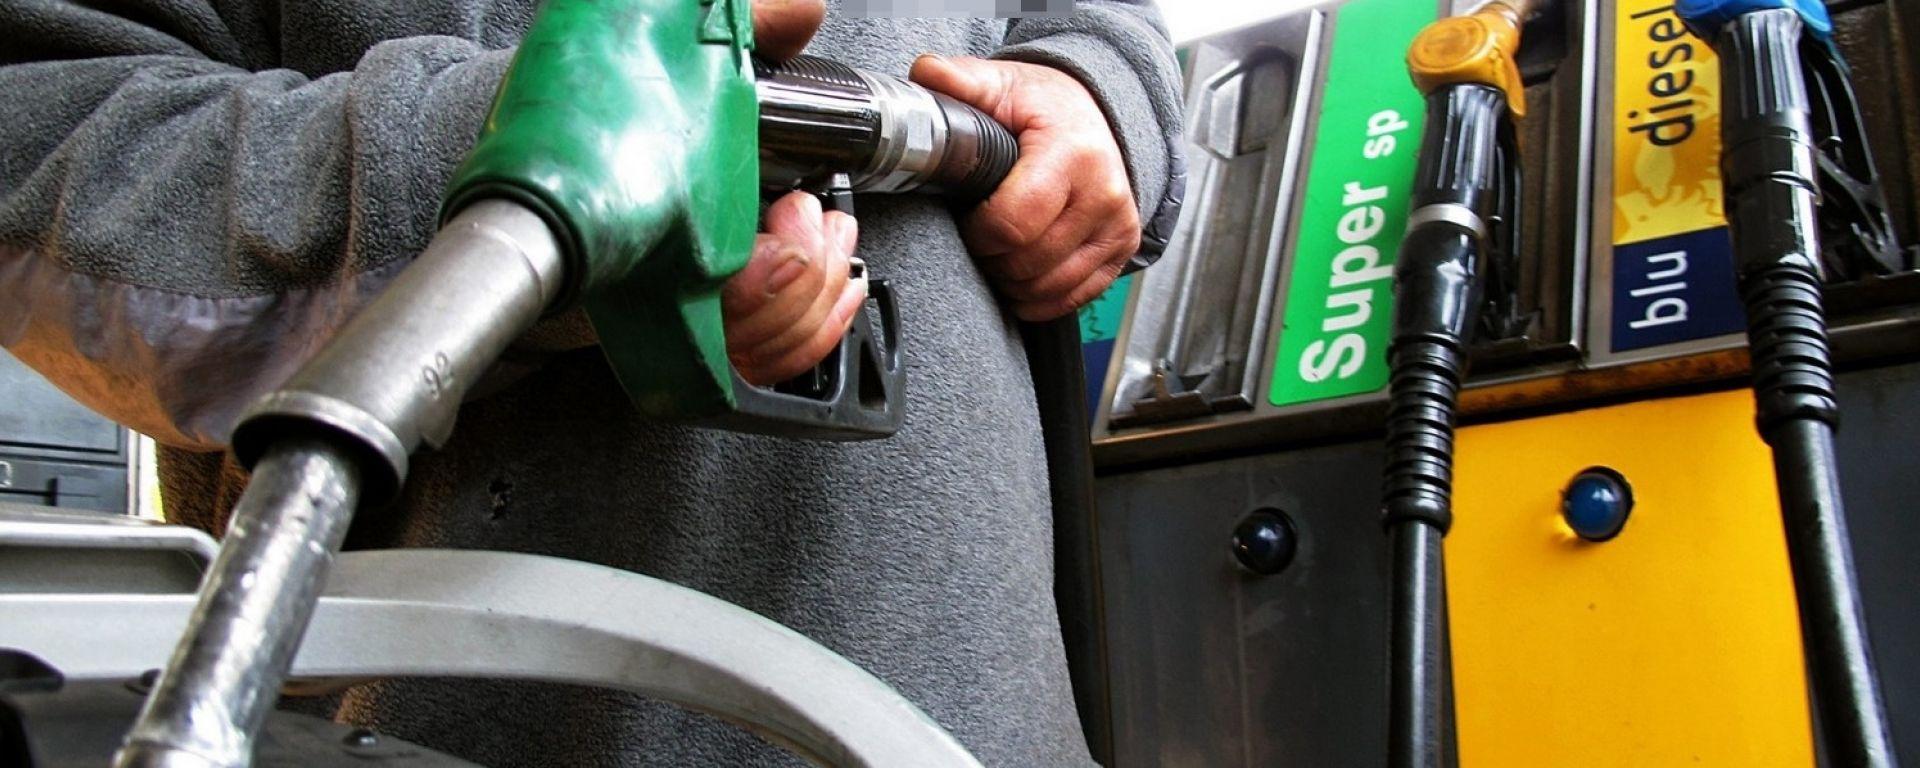 Benzina e gasolio, quante accise